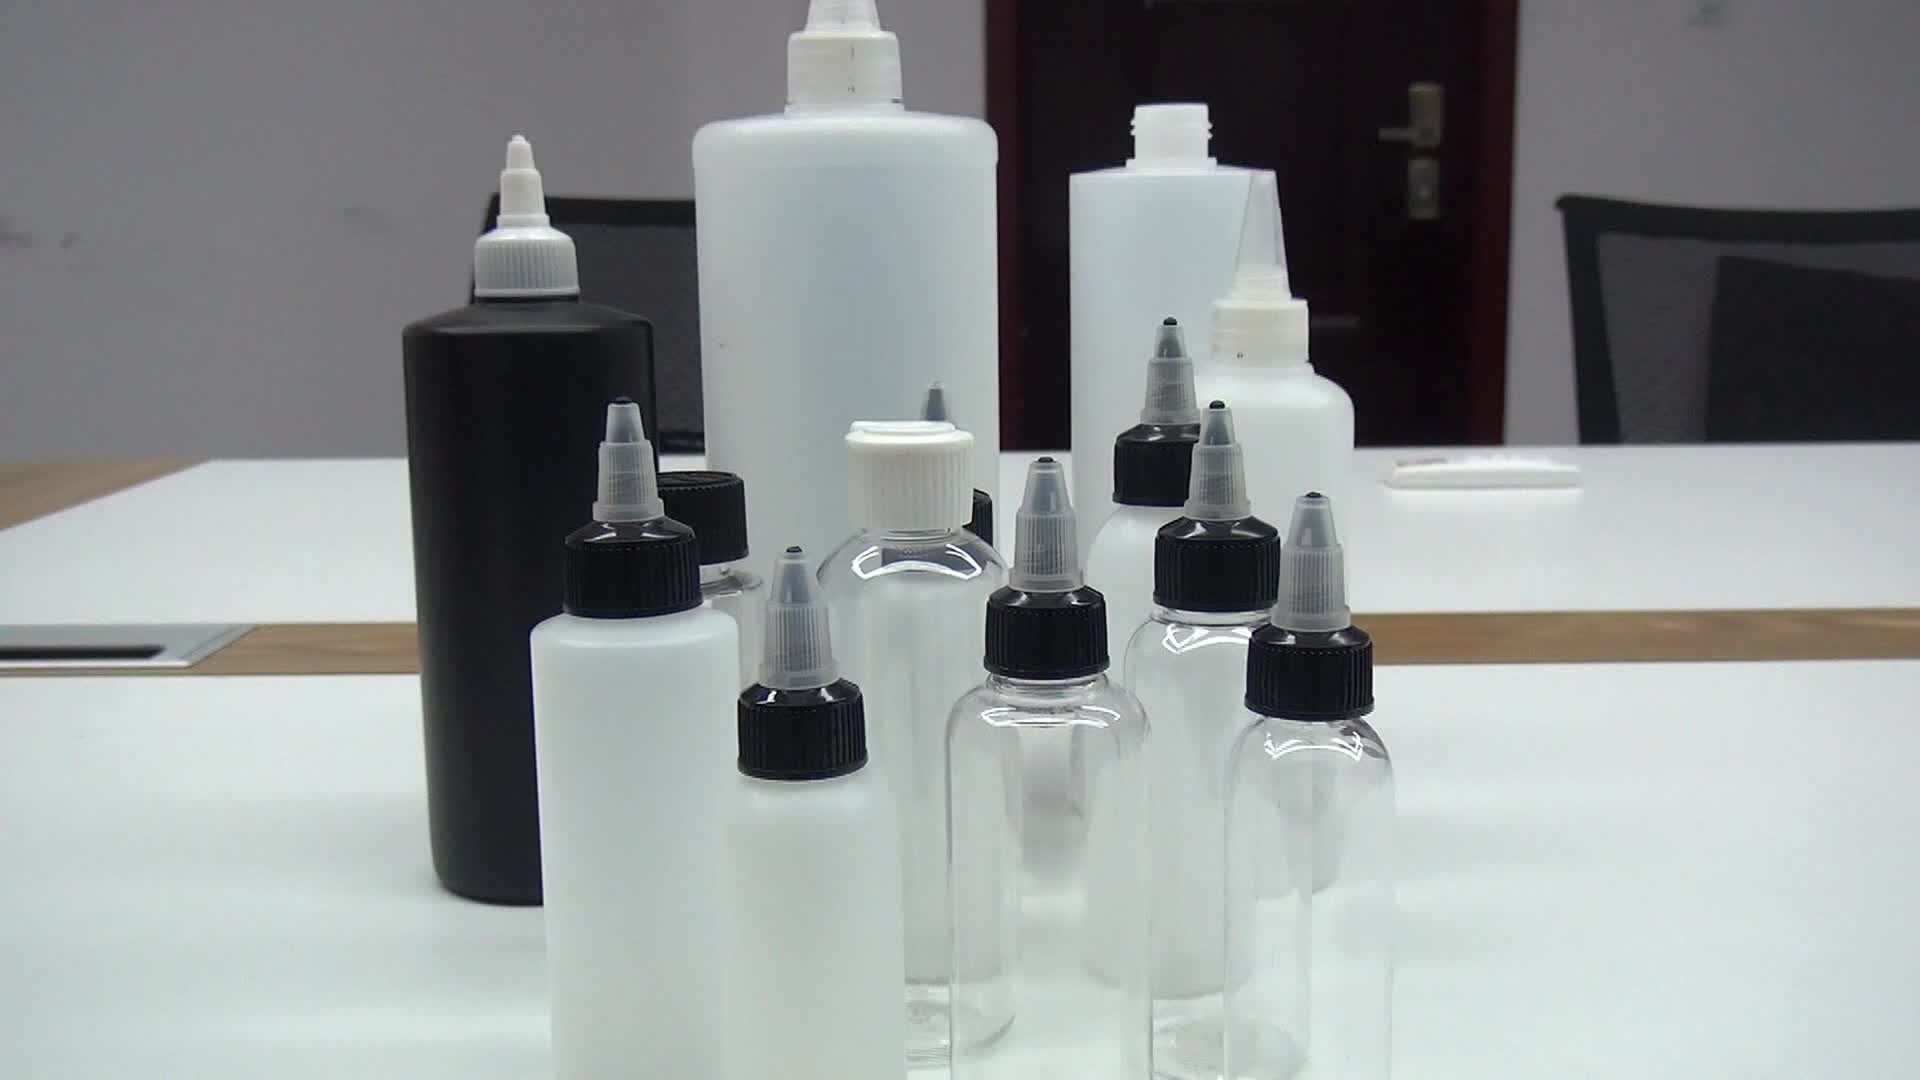 PE / PET Squeeze-Kunststoff-Tropfflasche mit Drehverschlusskappe 30ml 60ml 100ml 120ml 250ml 500ml 1000ml